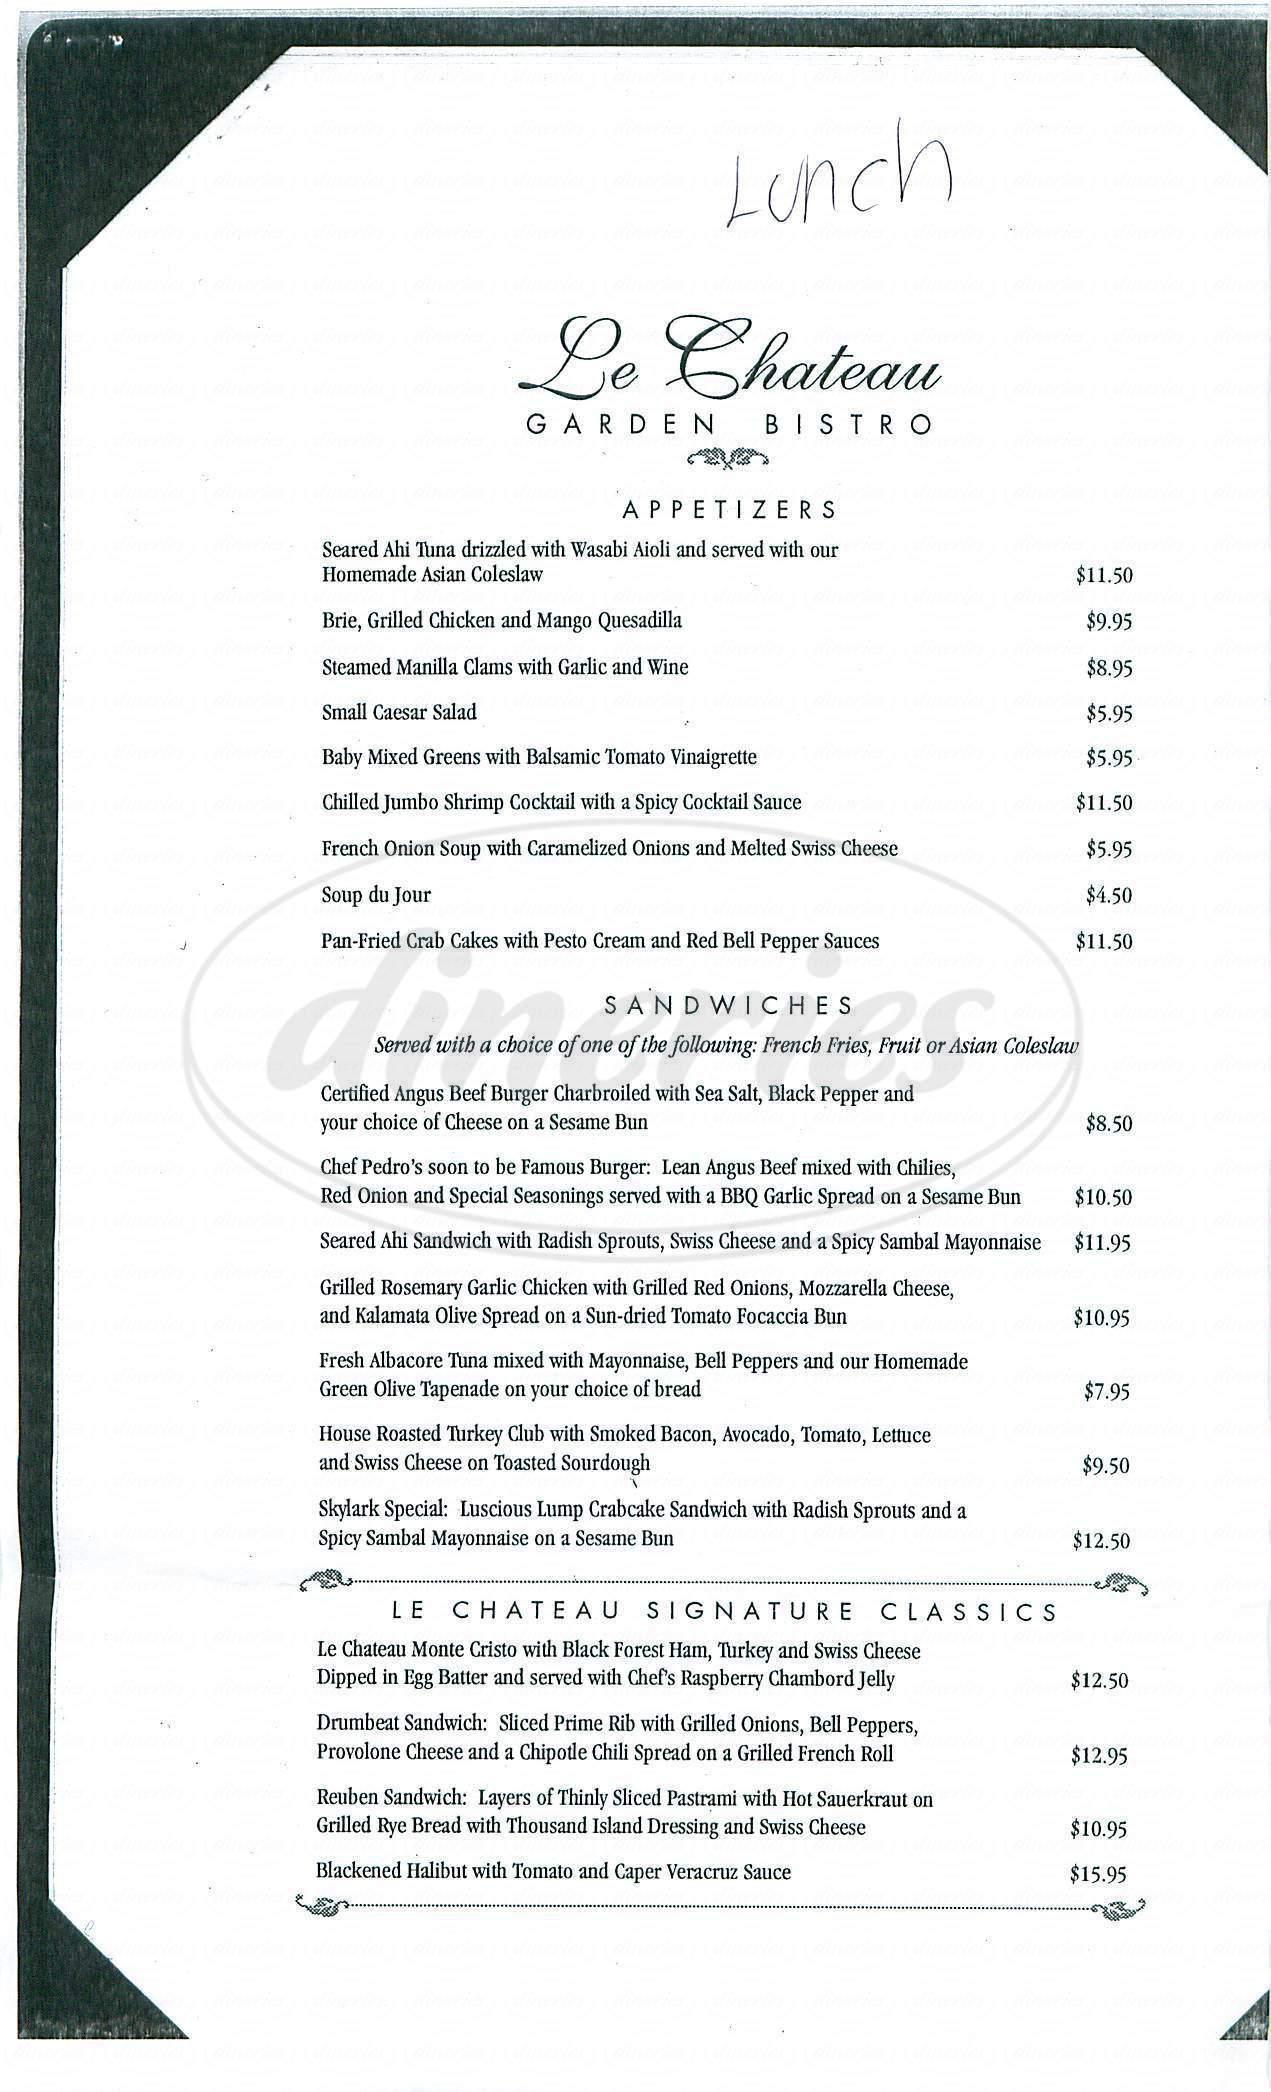 menu for Le Chateau Garden Bistro